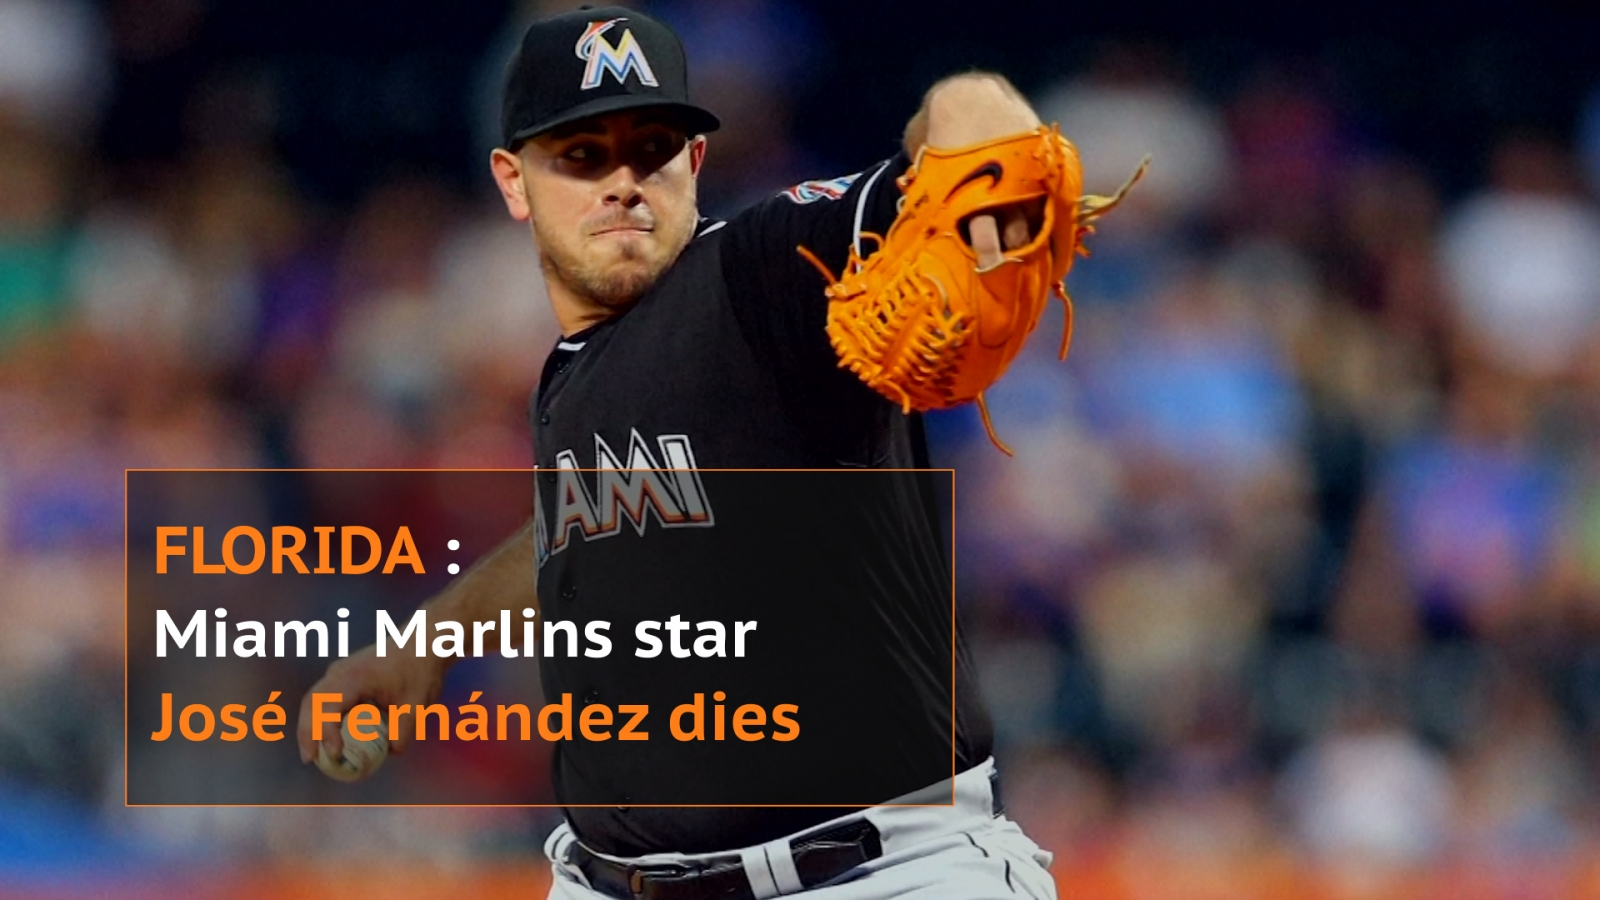 Miami Marlins baseball star José Fernández killed in boat crash